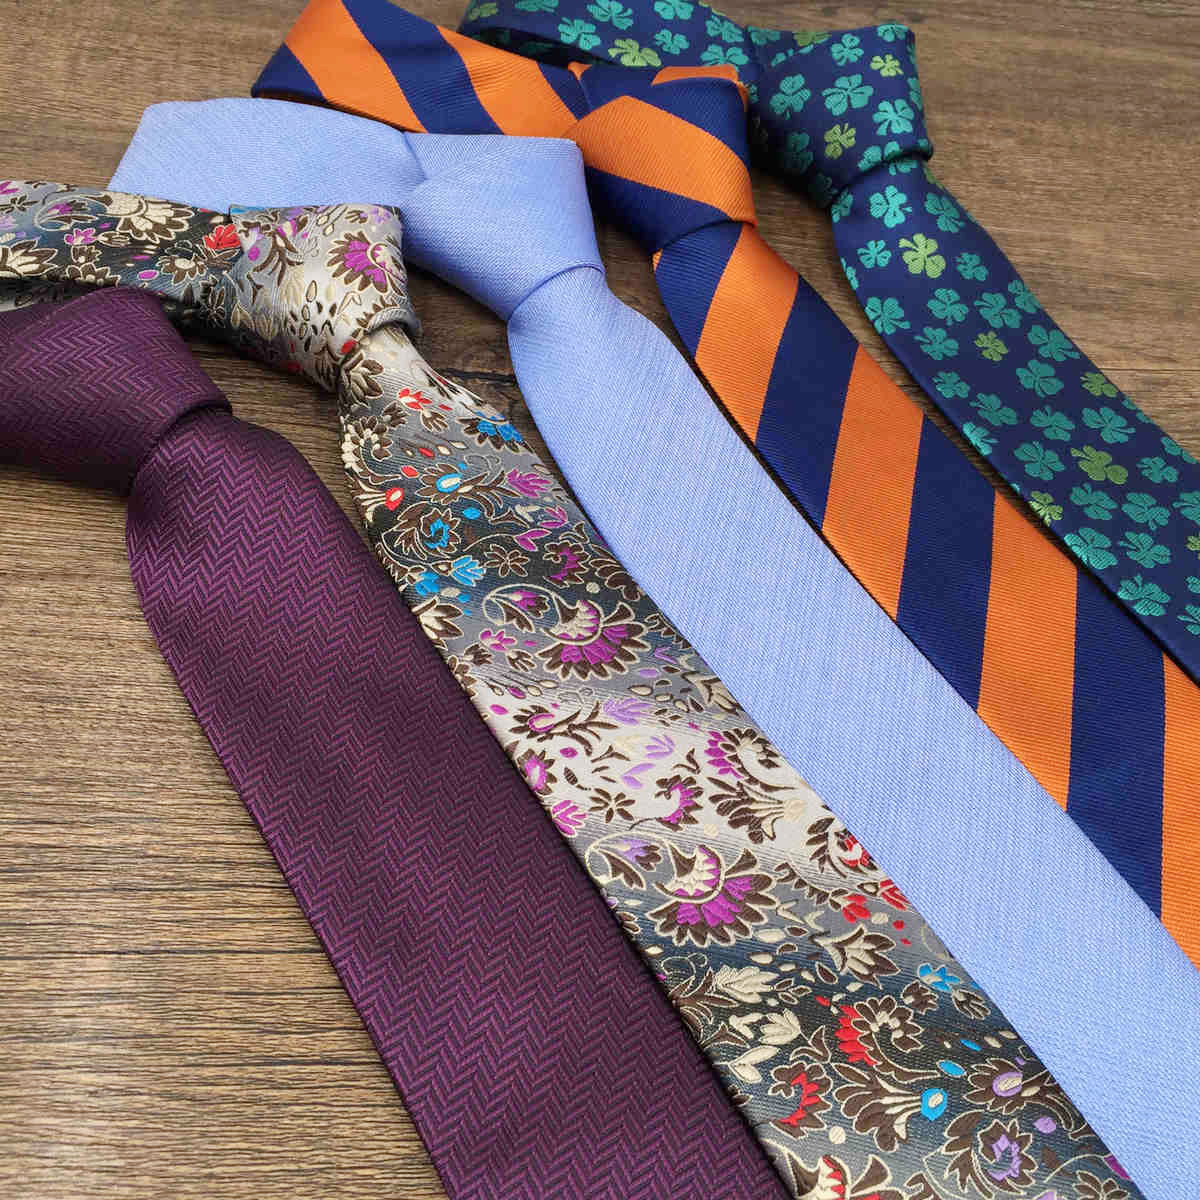 Accessories Ties For Men Paisley Classic Necktie Blue Green New